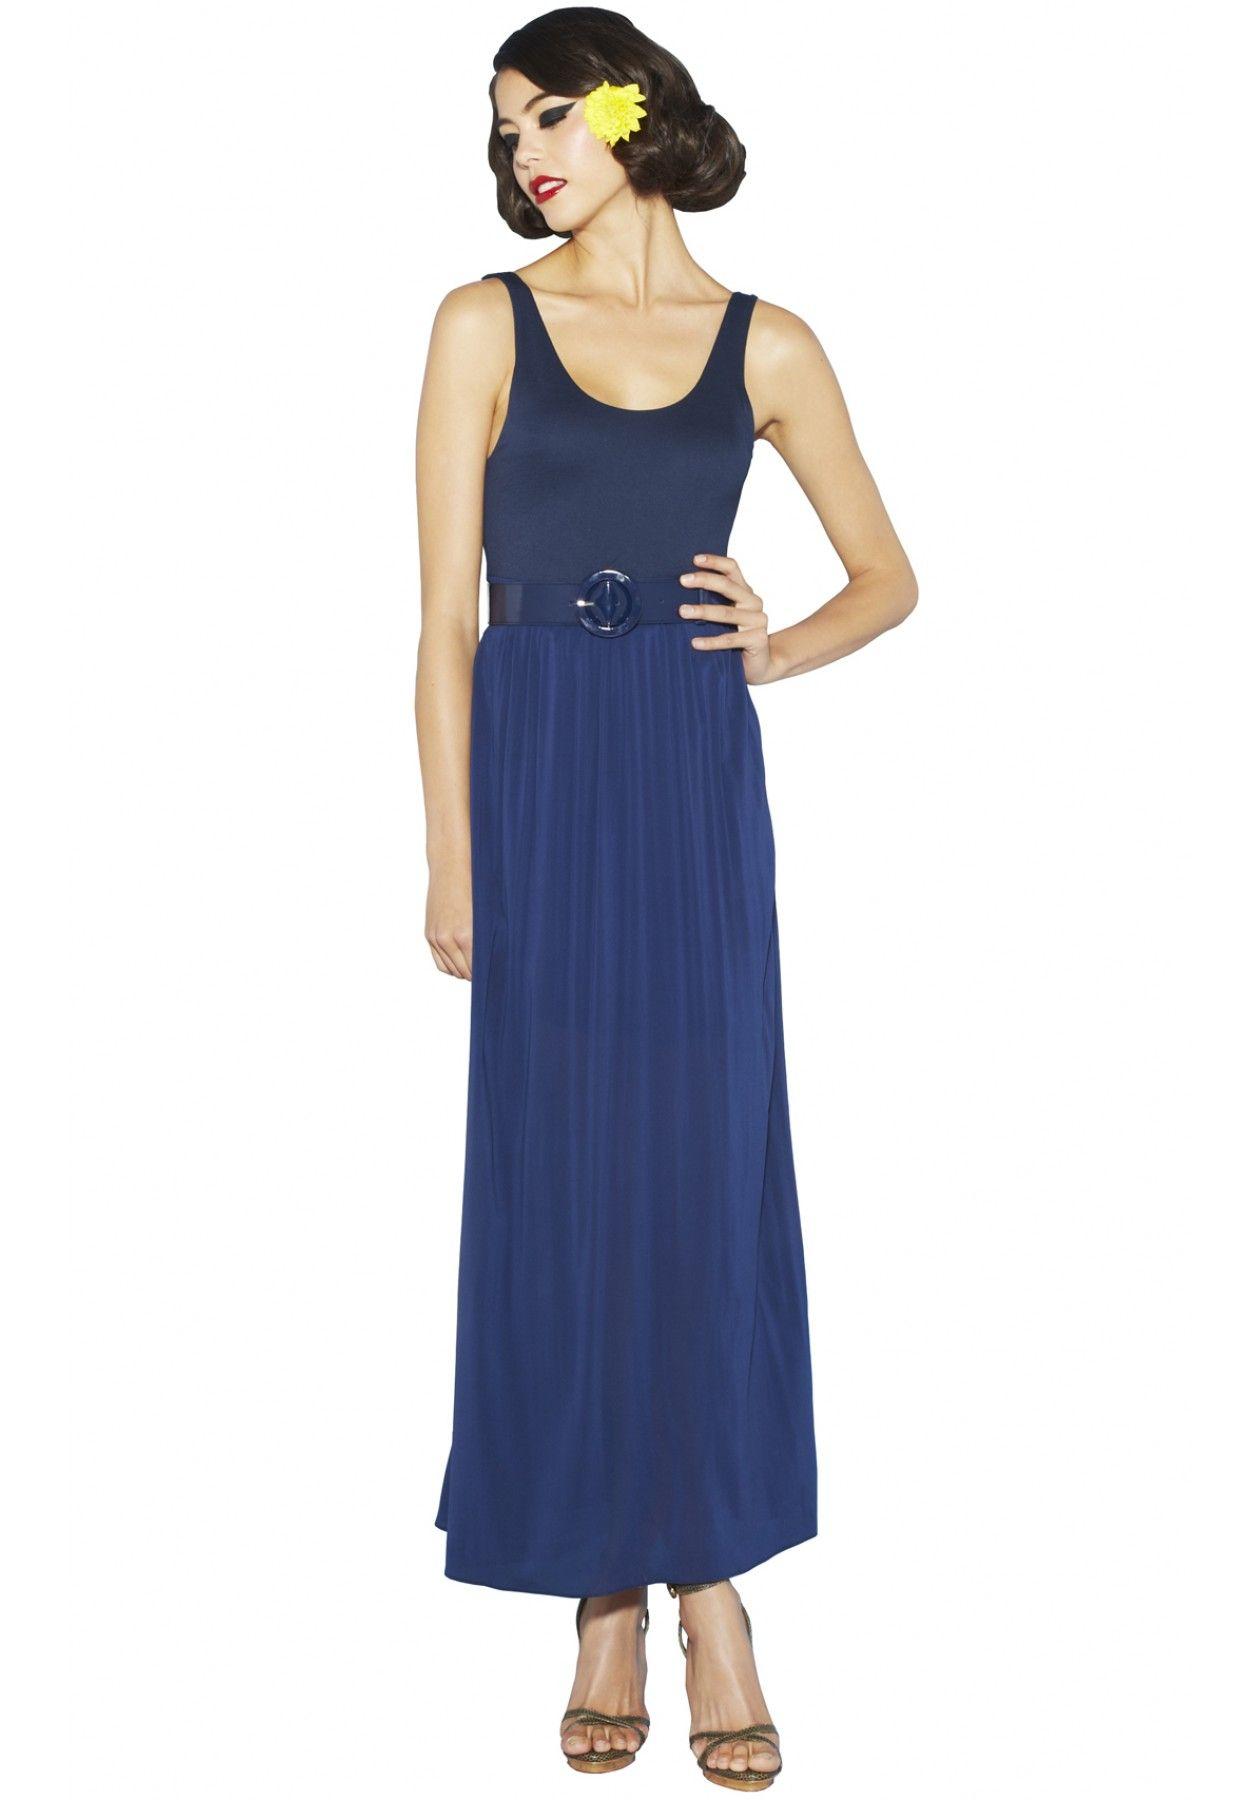 Kell Tank Maxi Dress With Belt Alice Olivia Dresses Maxi Tank Dress Maxi Dress [ 1800 x 1258 Pixel ]